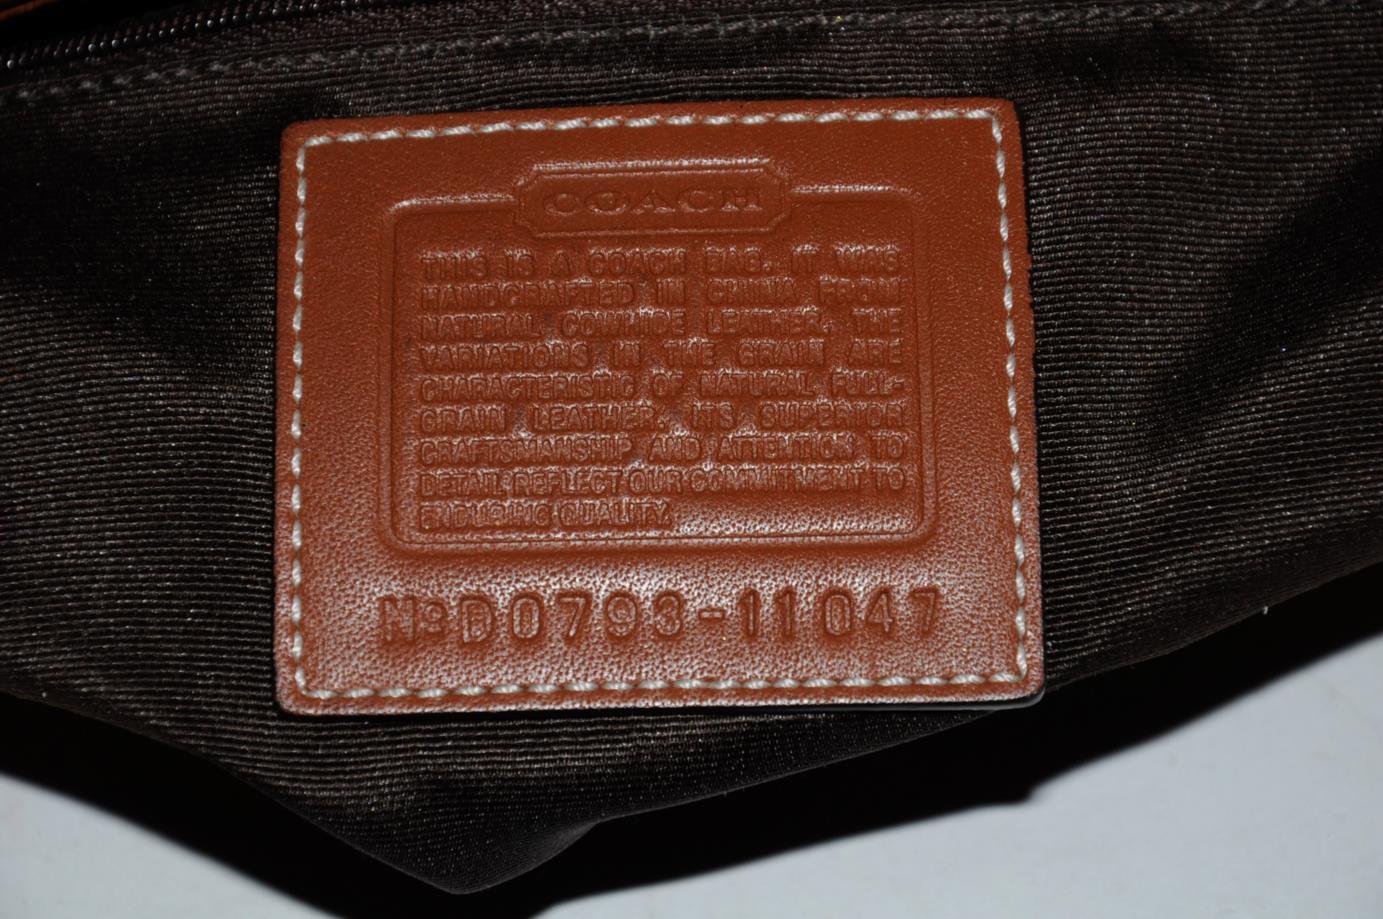 coach cognac brown leather twist lock shoulder bag tote purse 11047 ebay. Black Bedroom Furniture Sets. Home Design Ideas